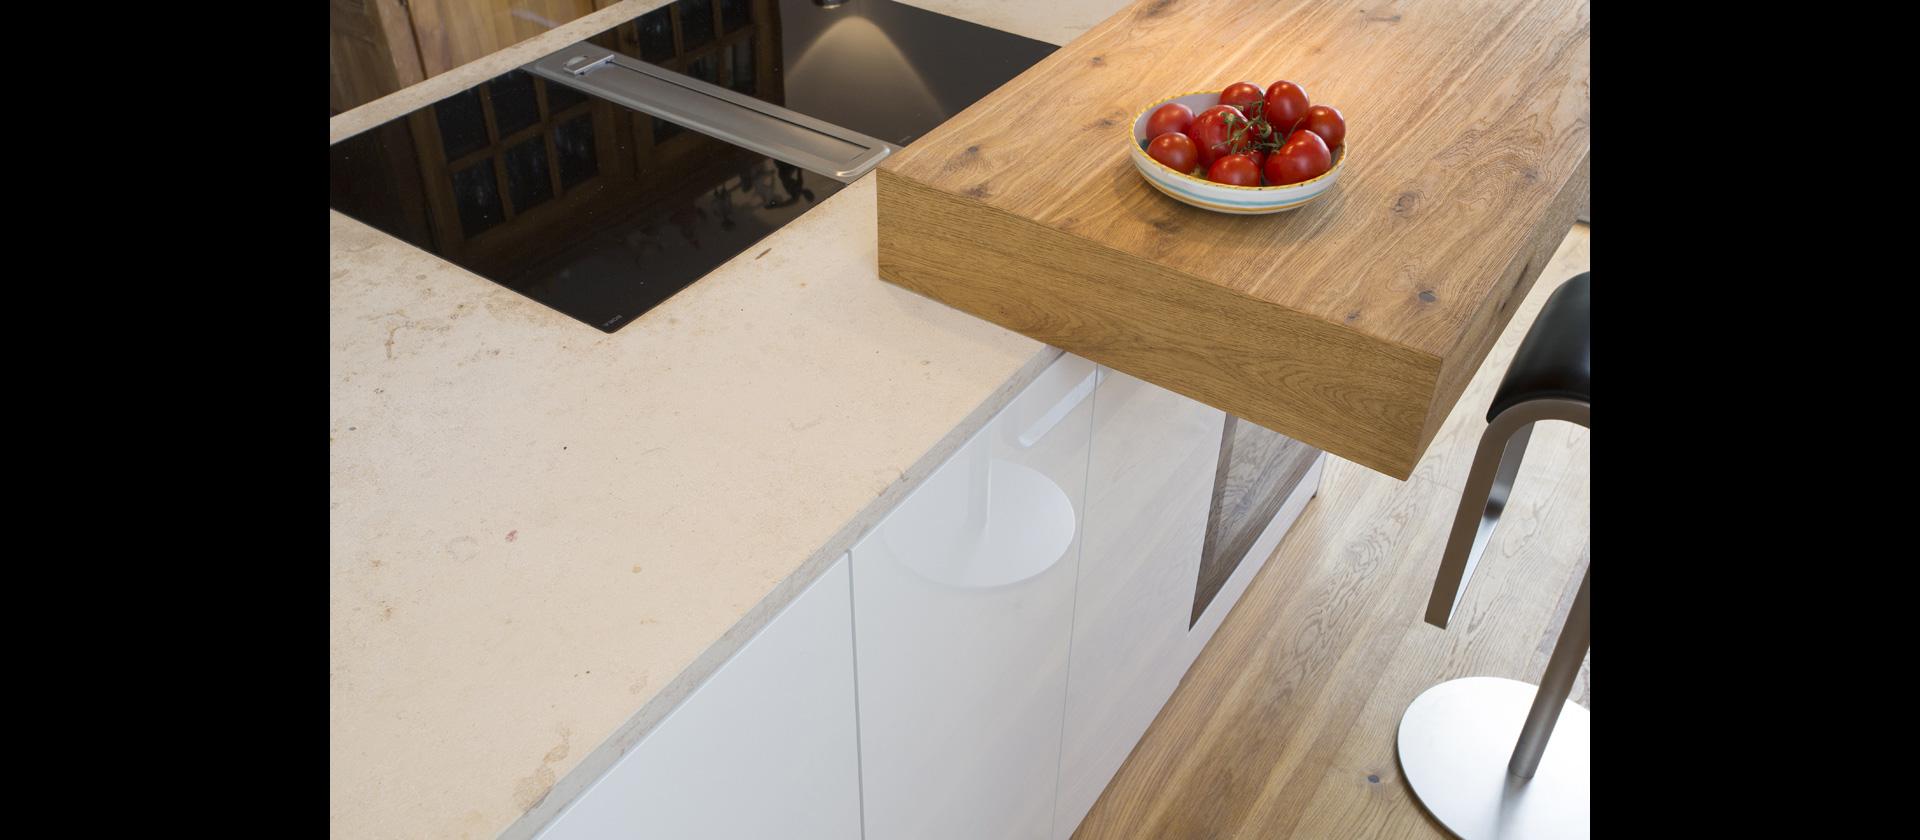 mtb k che mit freiem block bora professional abluft im bodenkanal verlegt. Black Bedroom Furniture Sets. Home Design Ideas